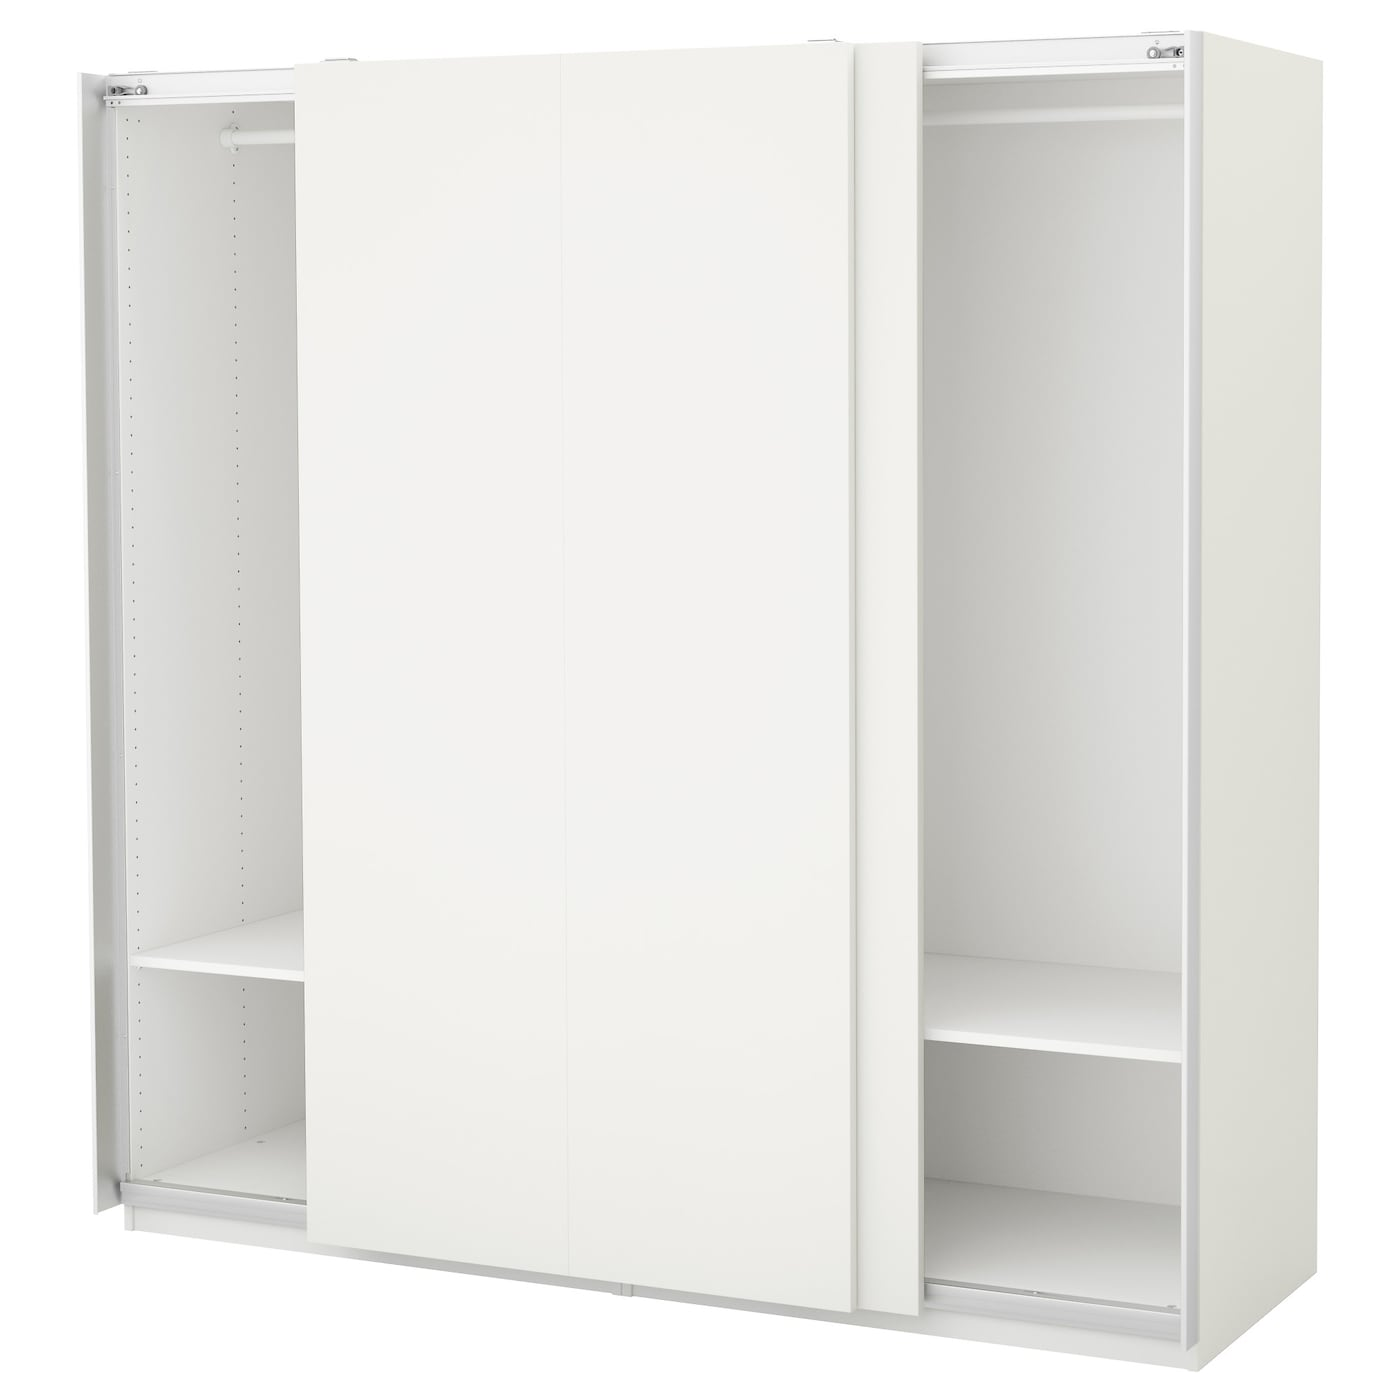 pax wardrobes design your own wardrobe at ikea. Black Bedroom Furniture Sets. Home Design Ideas